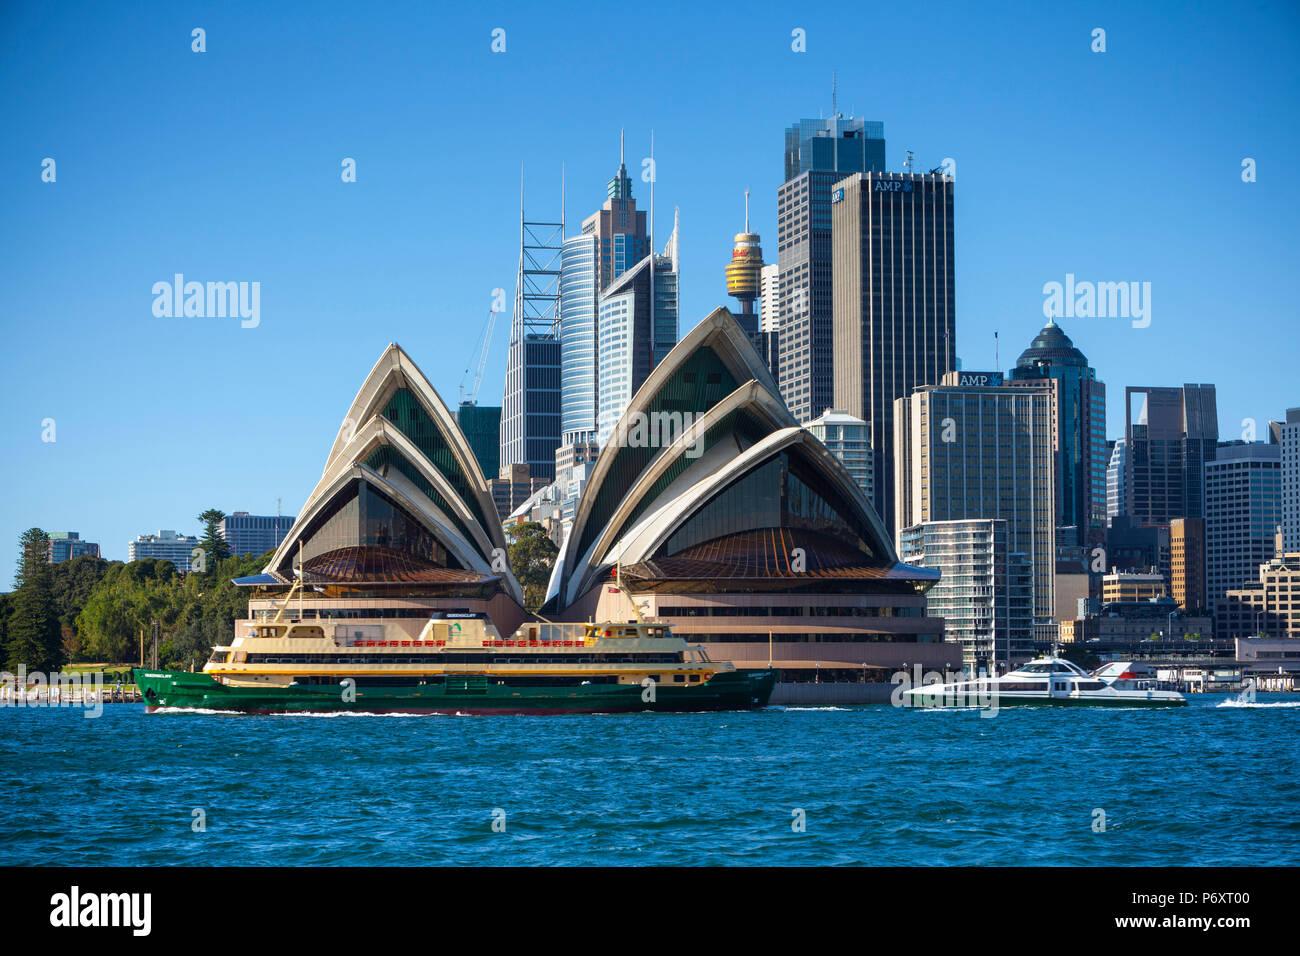 Sydney Opera House, Darling Harbour, Sydney, New South Wales, Australia - Stock Image